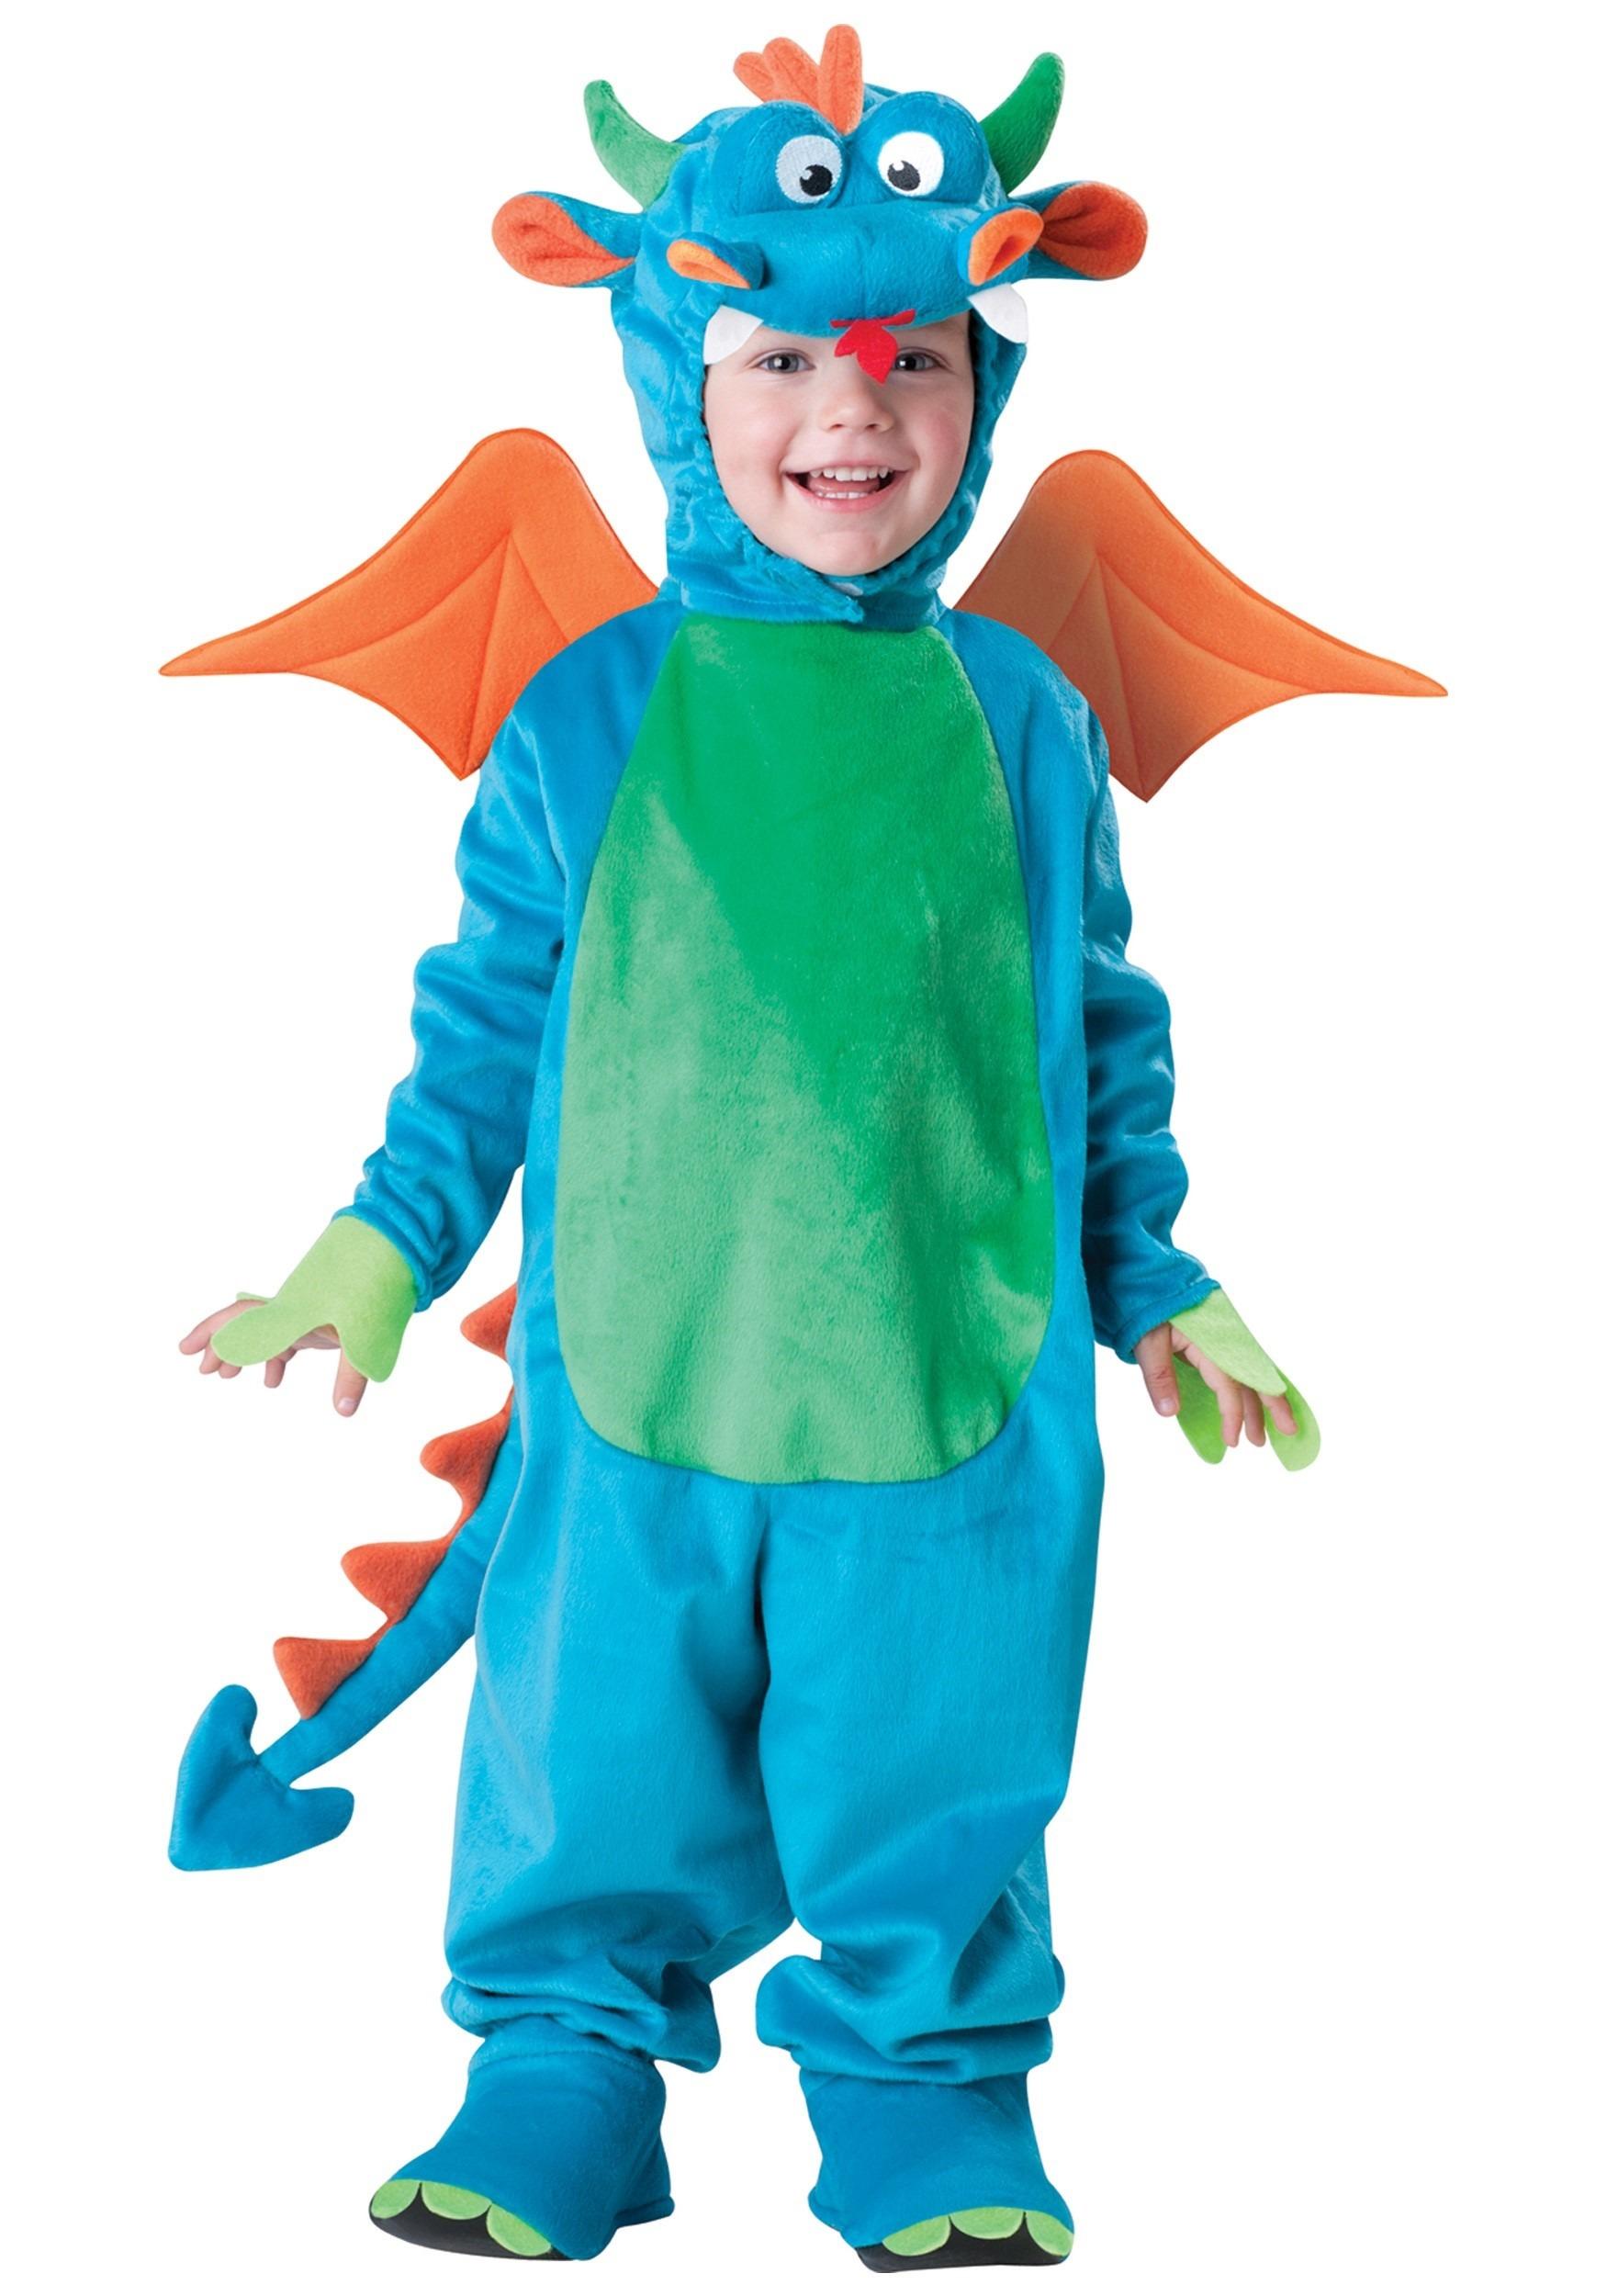 Toddler Dinky Dragon Costume  sc 1 st  Halloween Costume & Toddler Dinky Dragon Costume - Child Dragon Dinosaur Costume Ideas